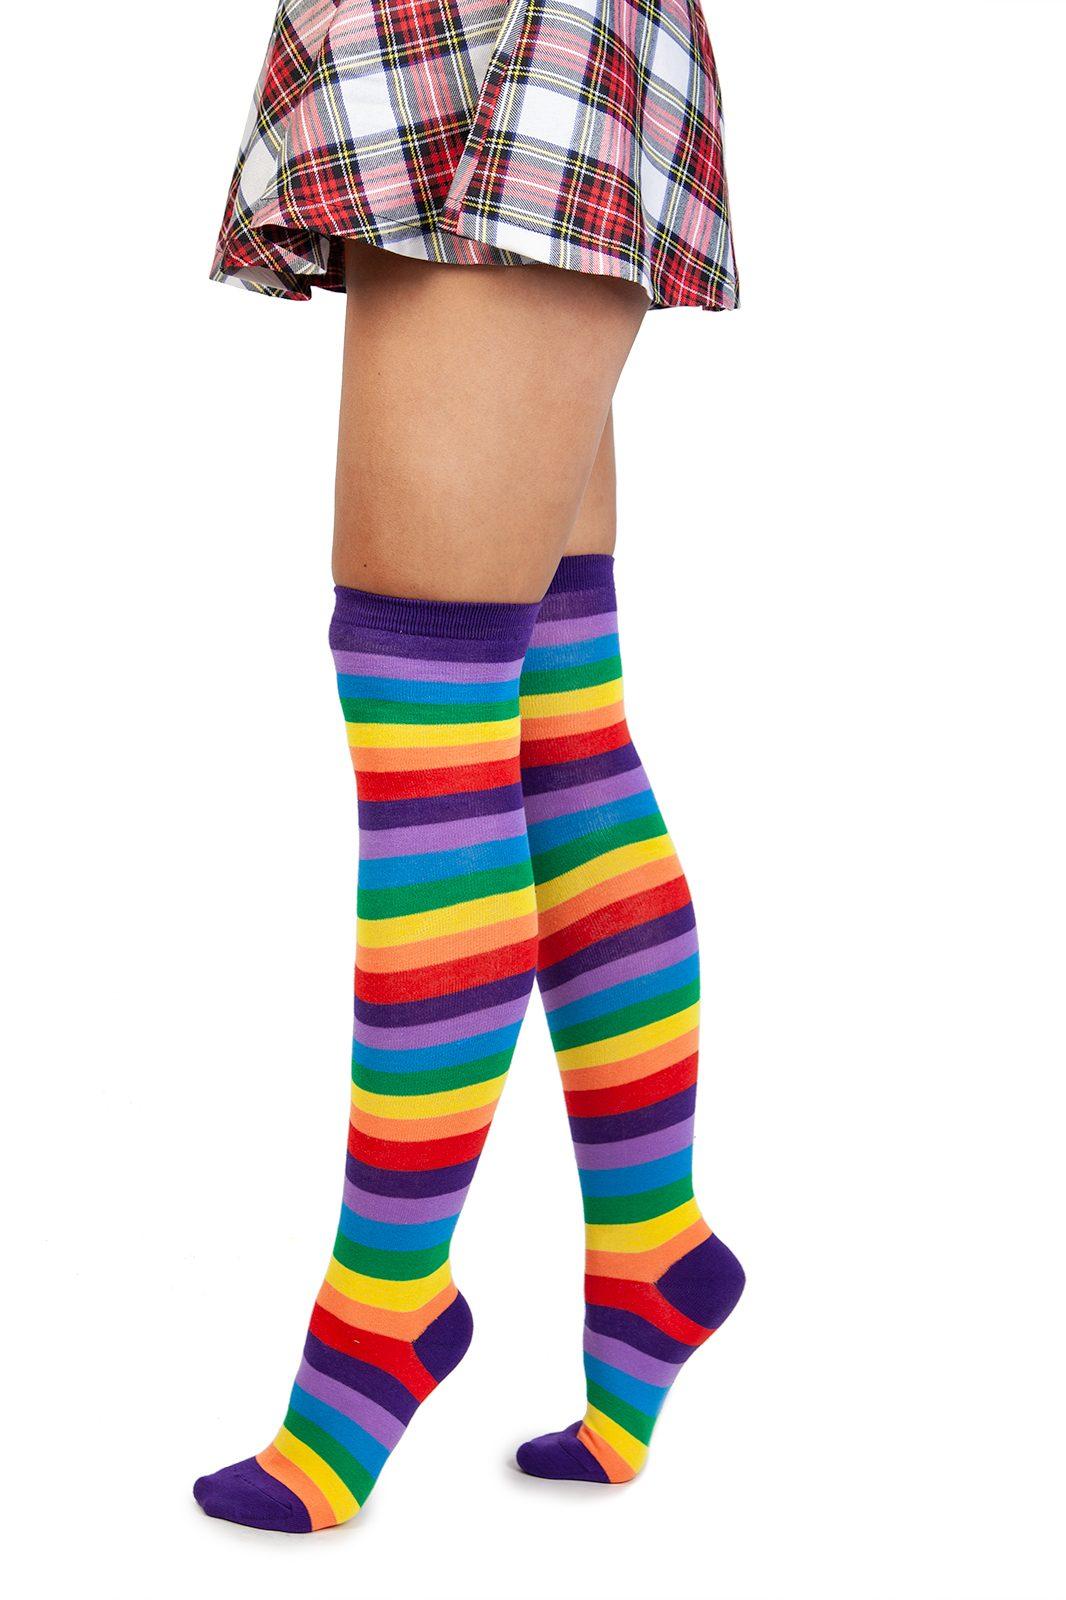 Rainbow Striped Welly Socks